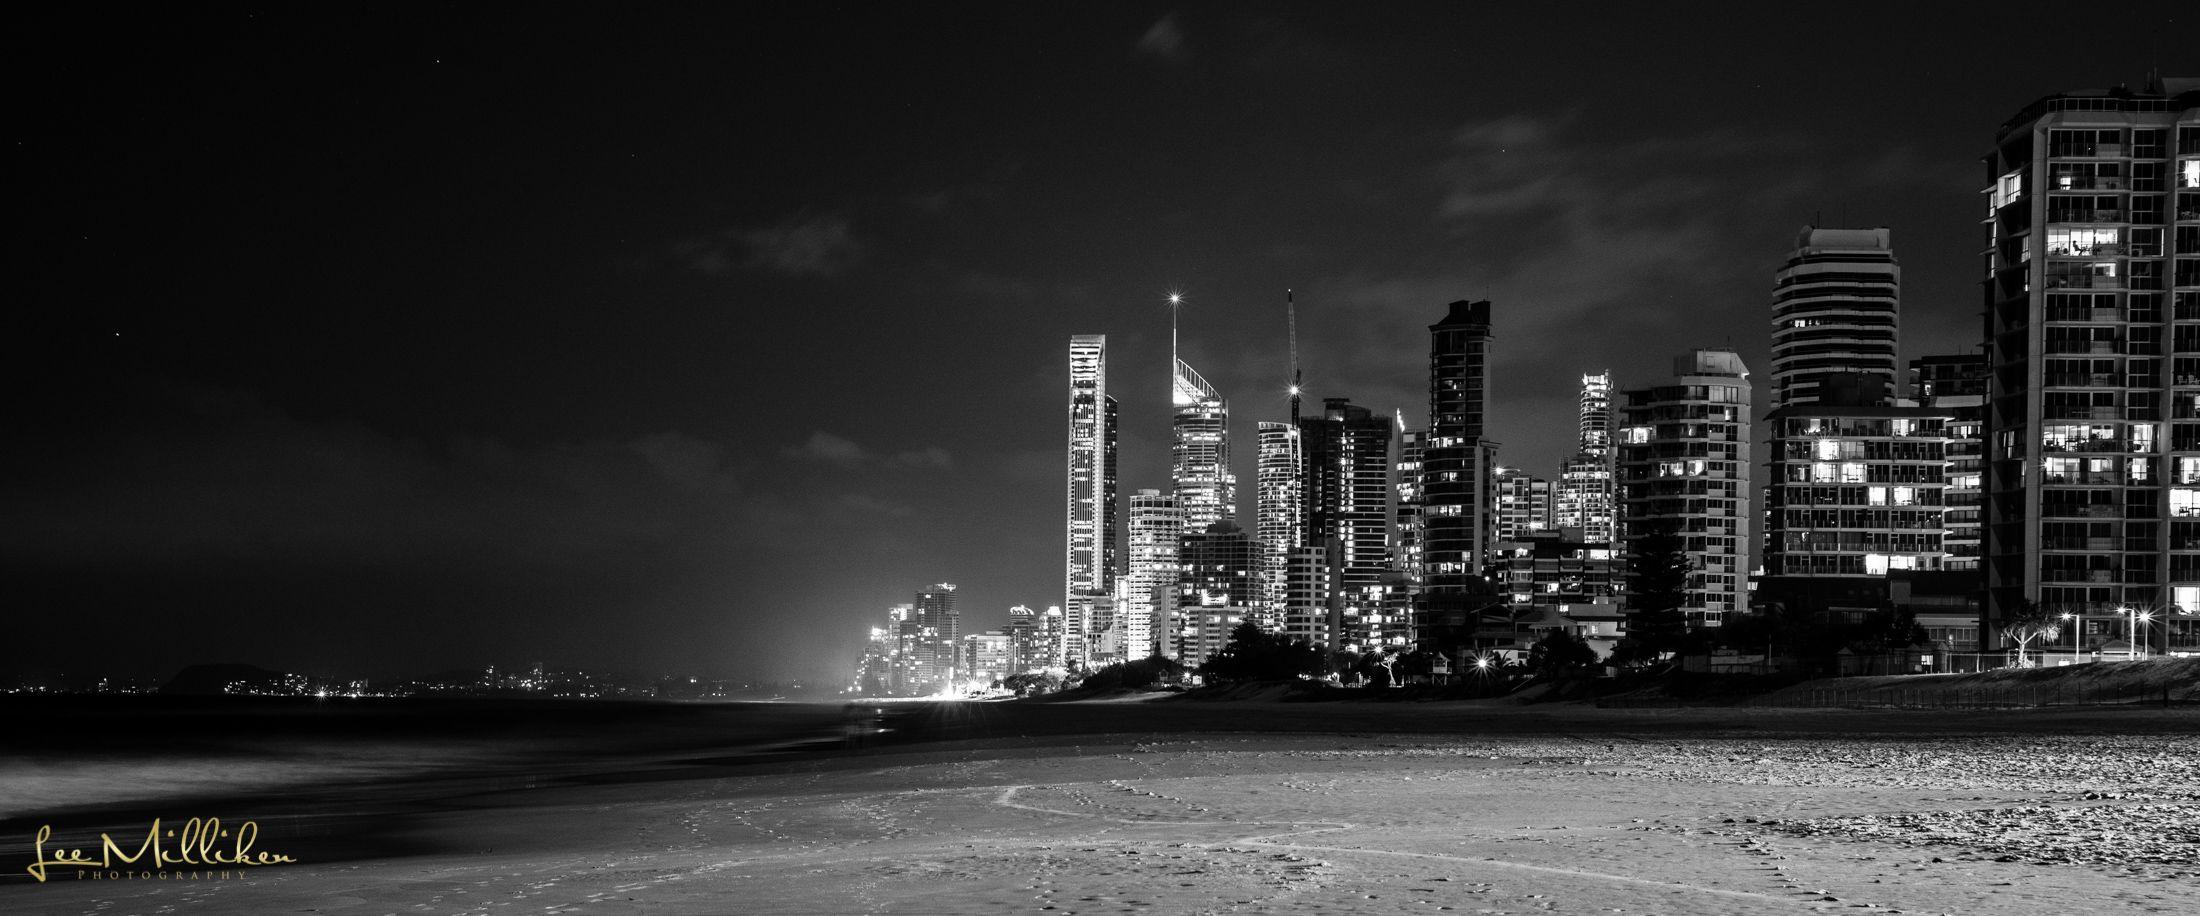 #surfers #surfersparadise #city #night #nightshot #beach #paradise #b&w #q1 #australia #photo #nikon #nikonshooter #landscape #landscapephotogrpahy #leemillikenphotography